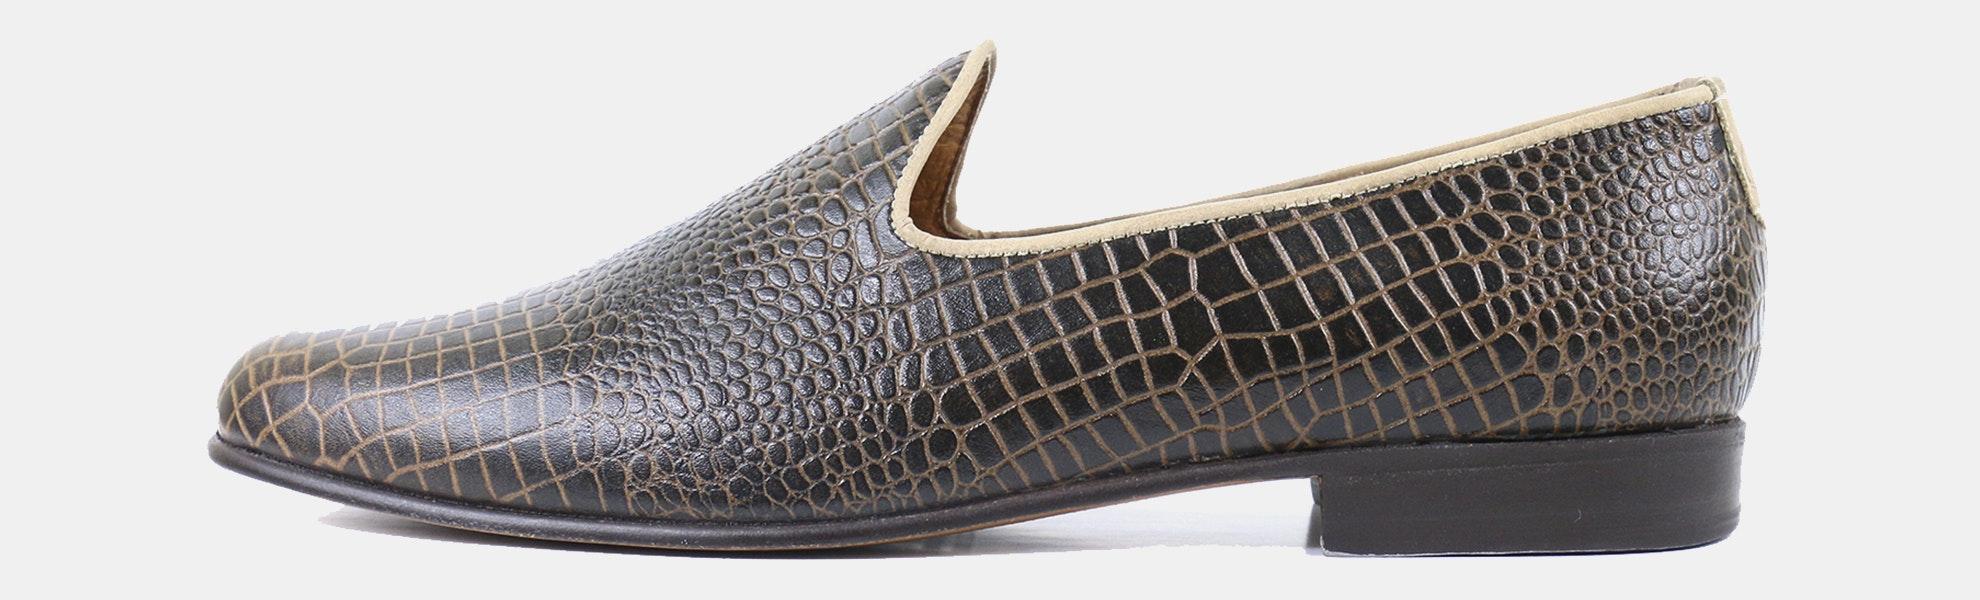 Caballero Wear Slippers